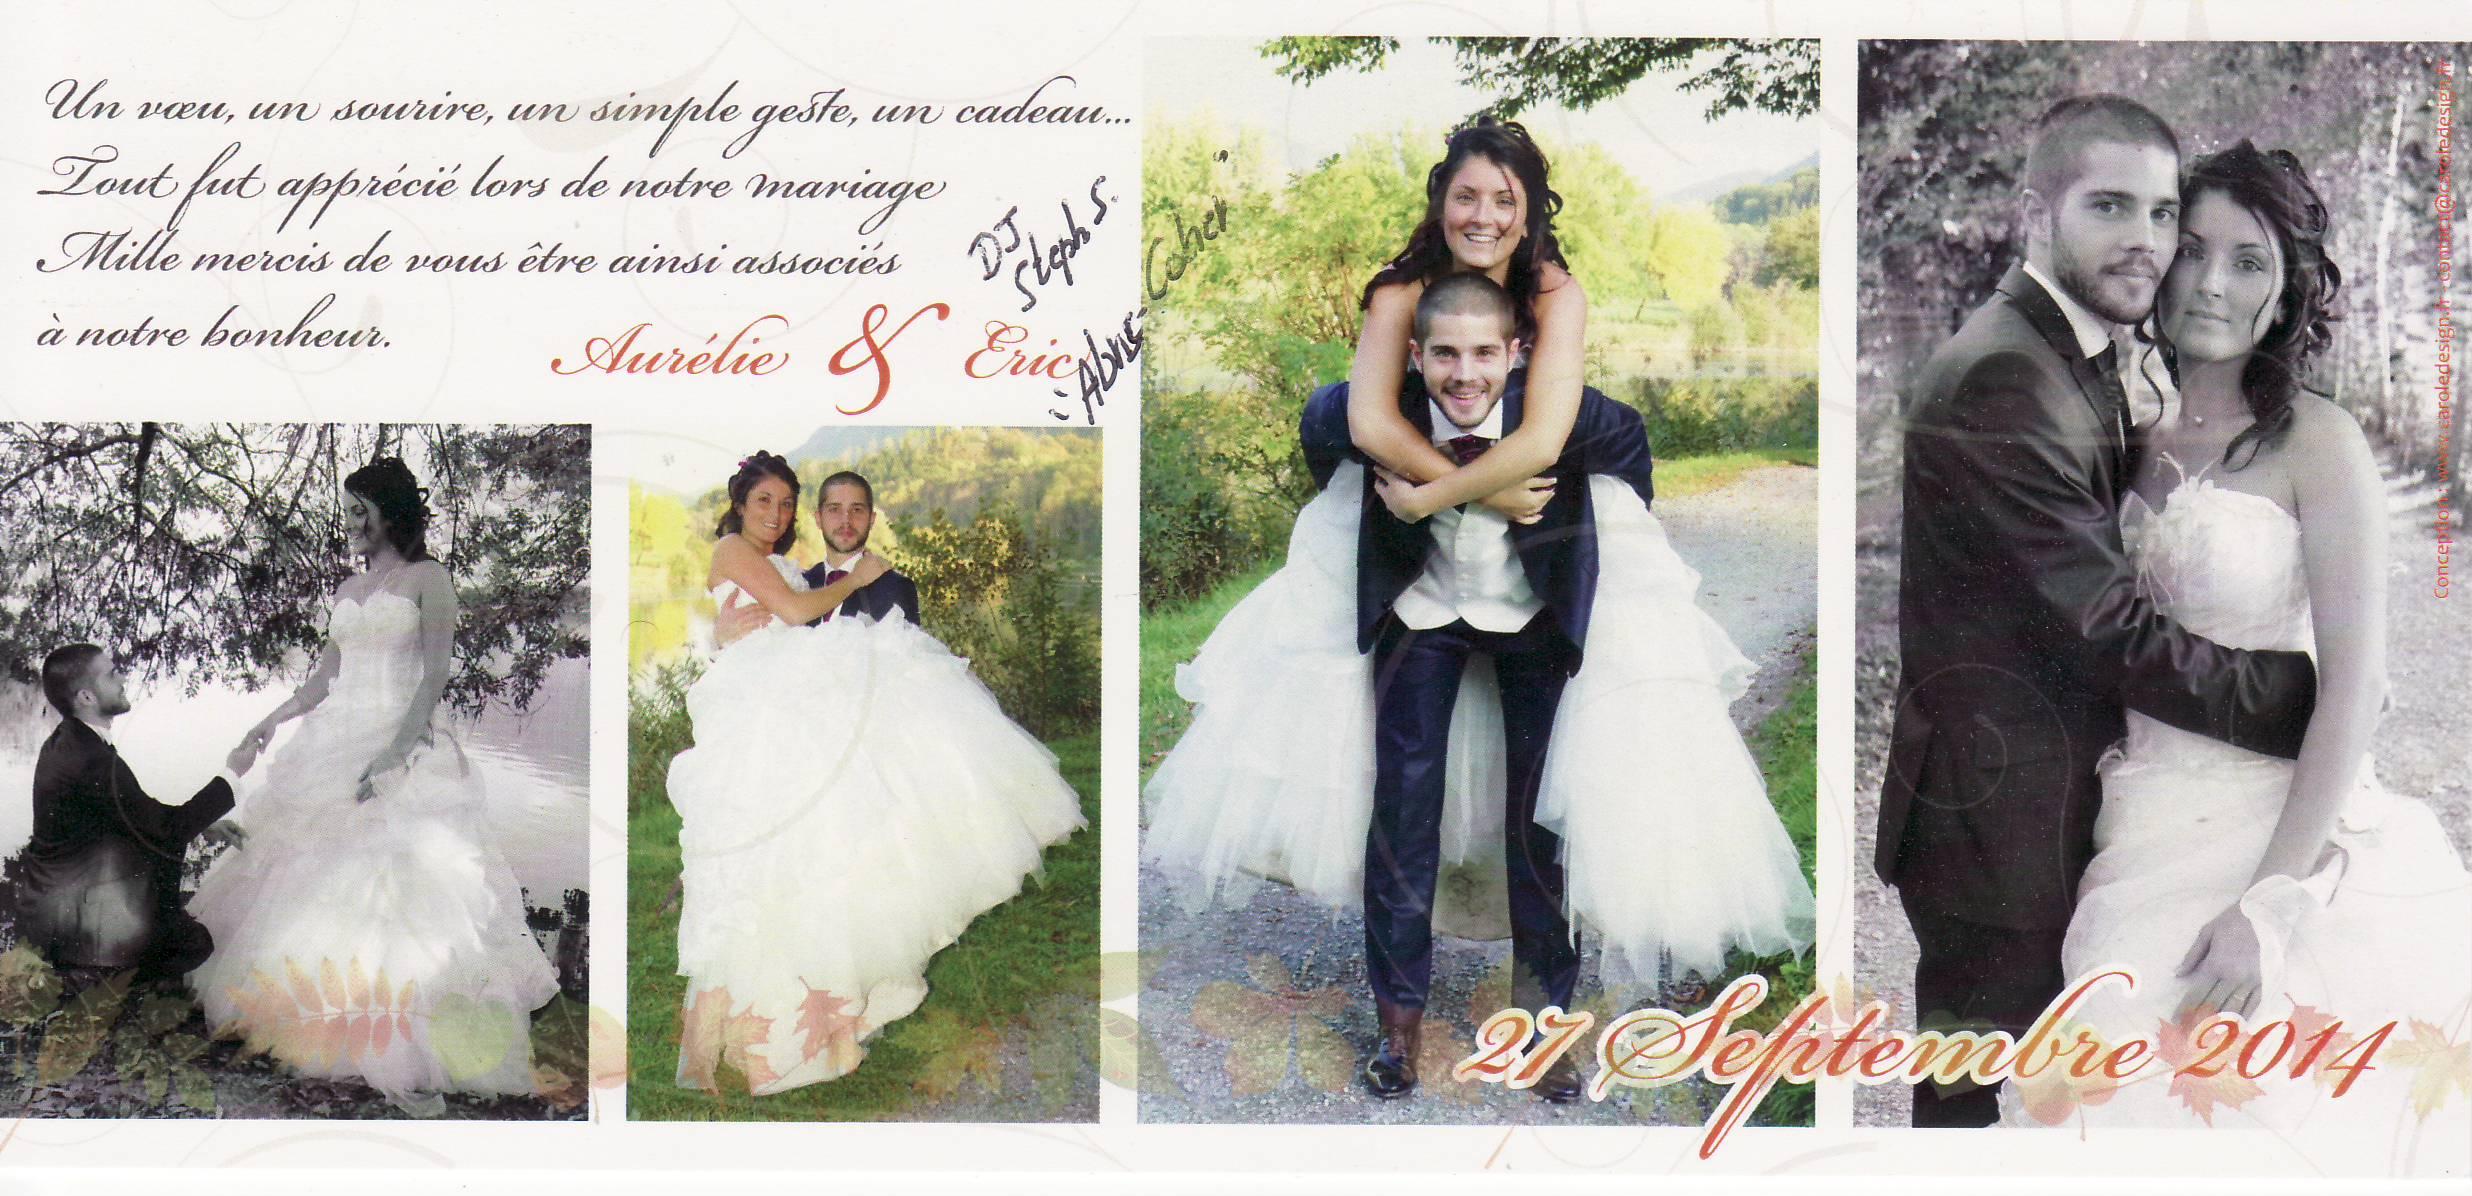 Mariage CHATEL Eric & Aurélie (Abris-Côtier) (27-09-2014).JPG